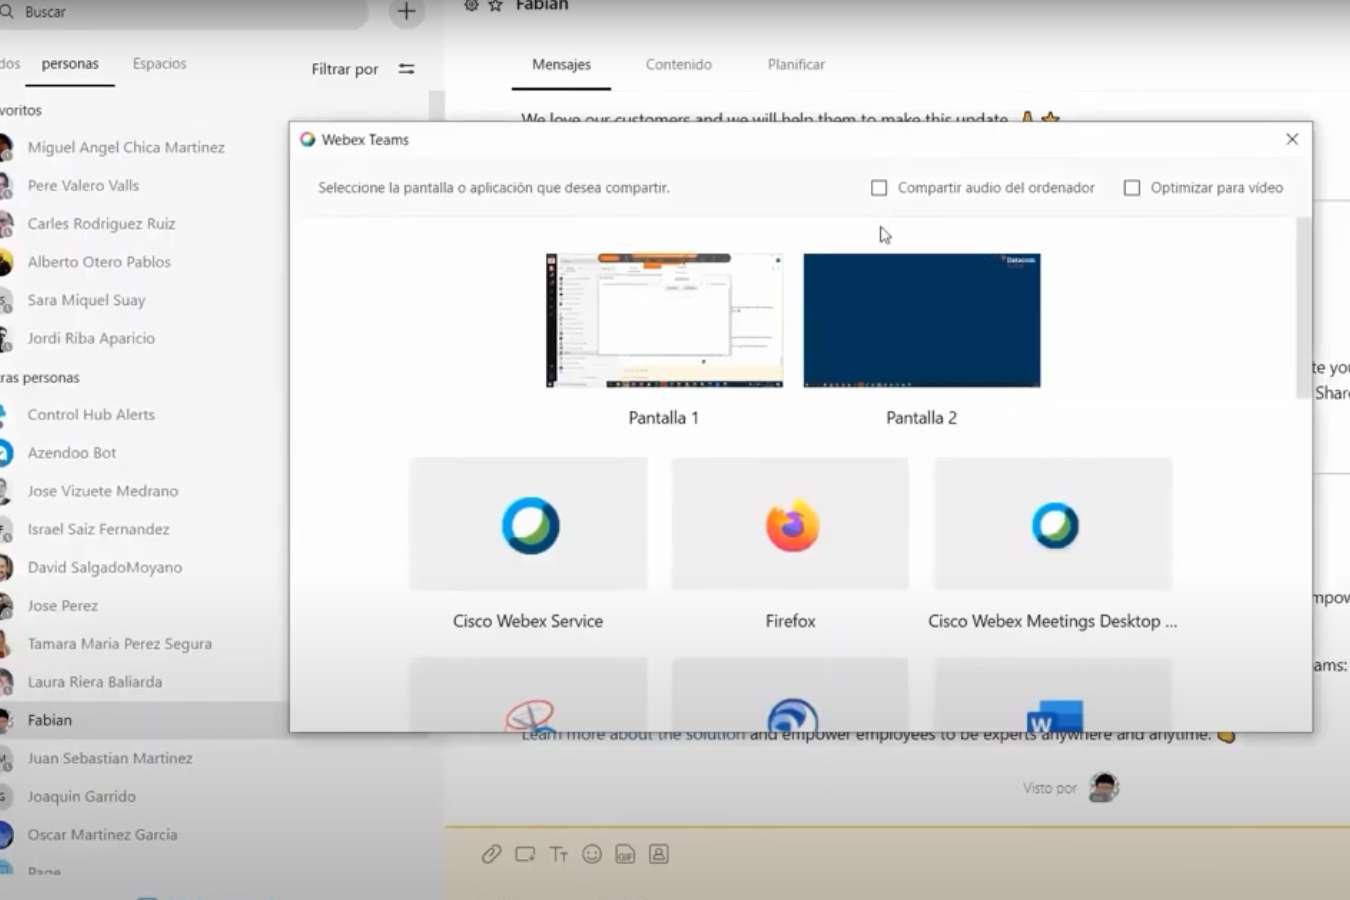 Compartir Contenido con Equipos Cisco Webex